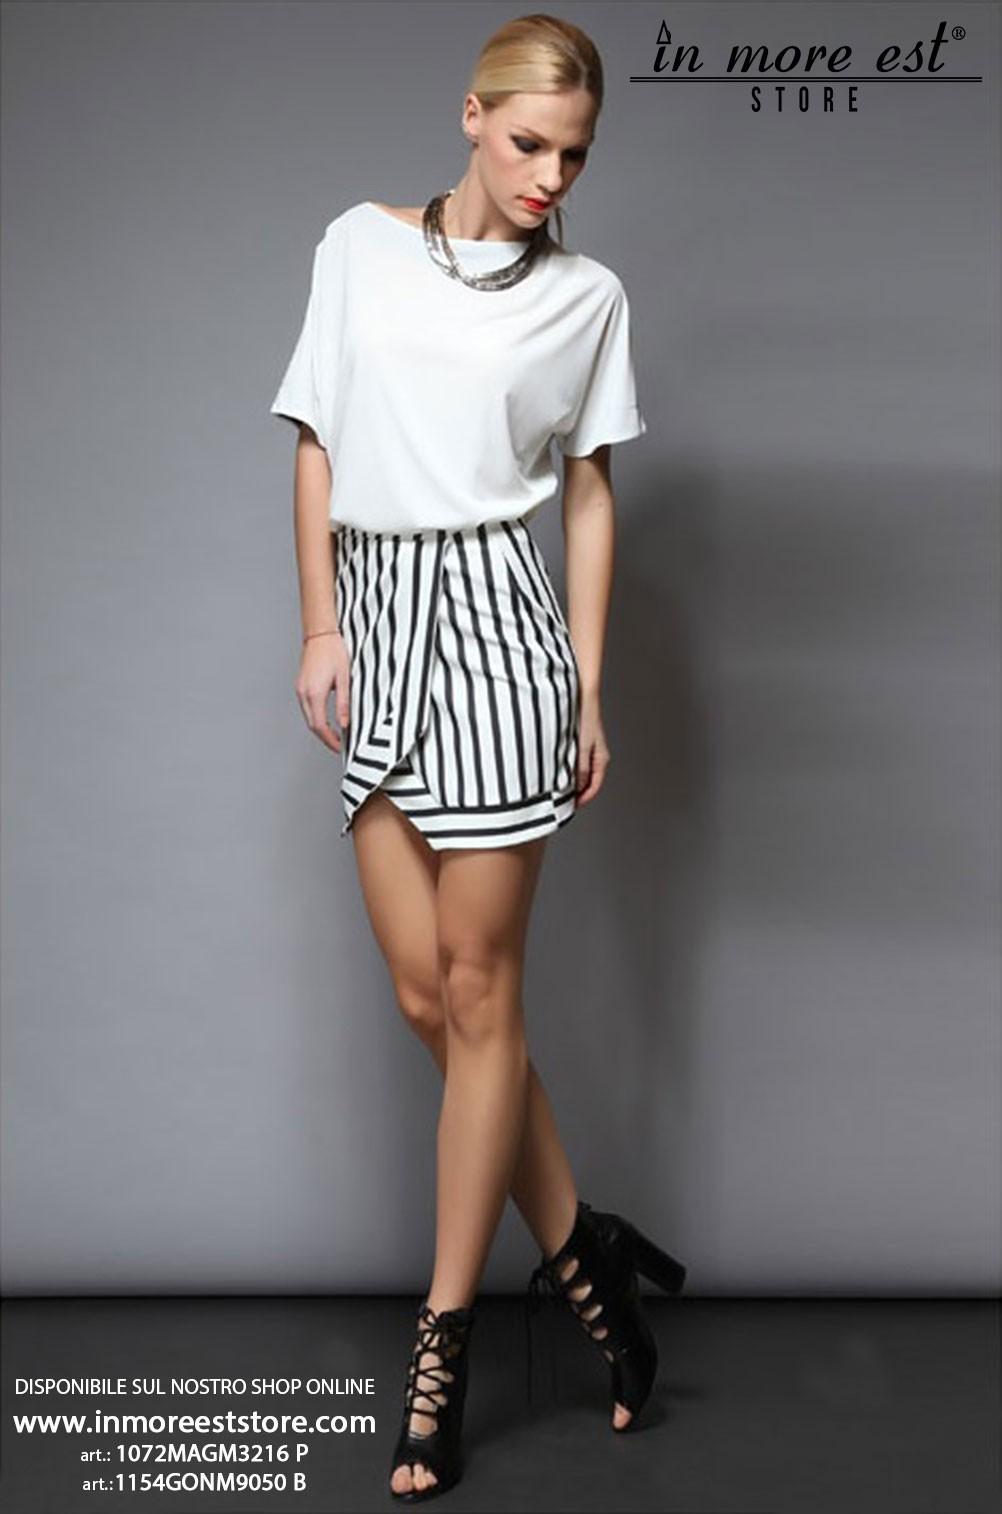 Estremamente Gonne - In More Est Store CN46